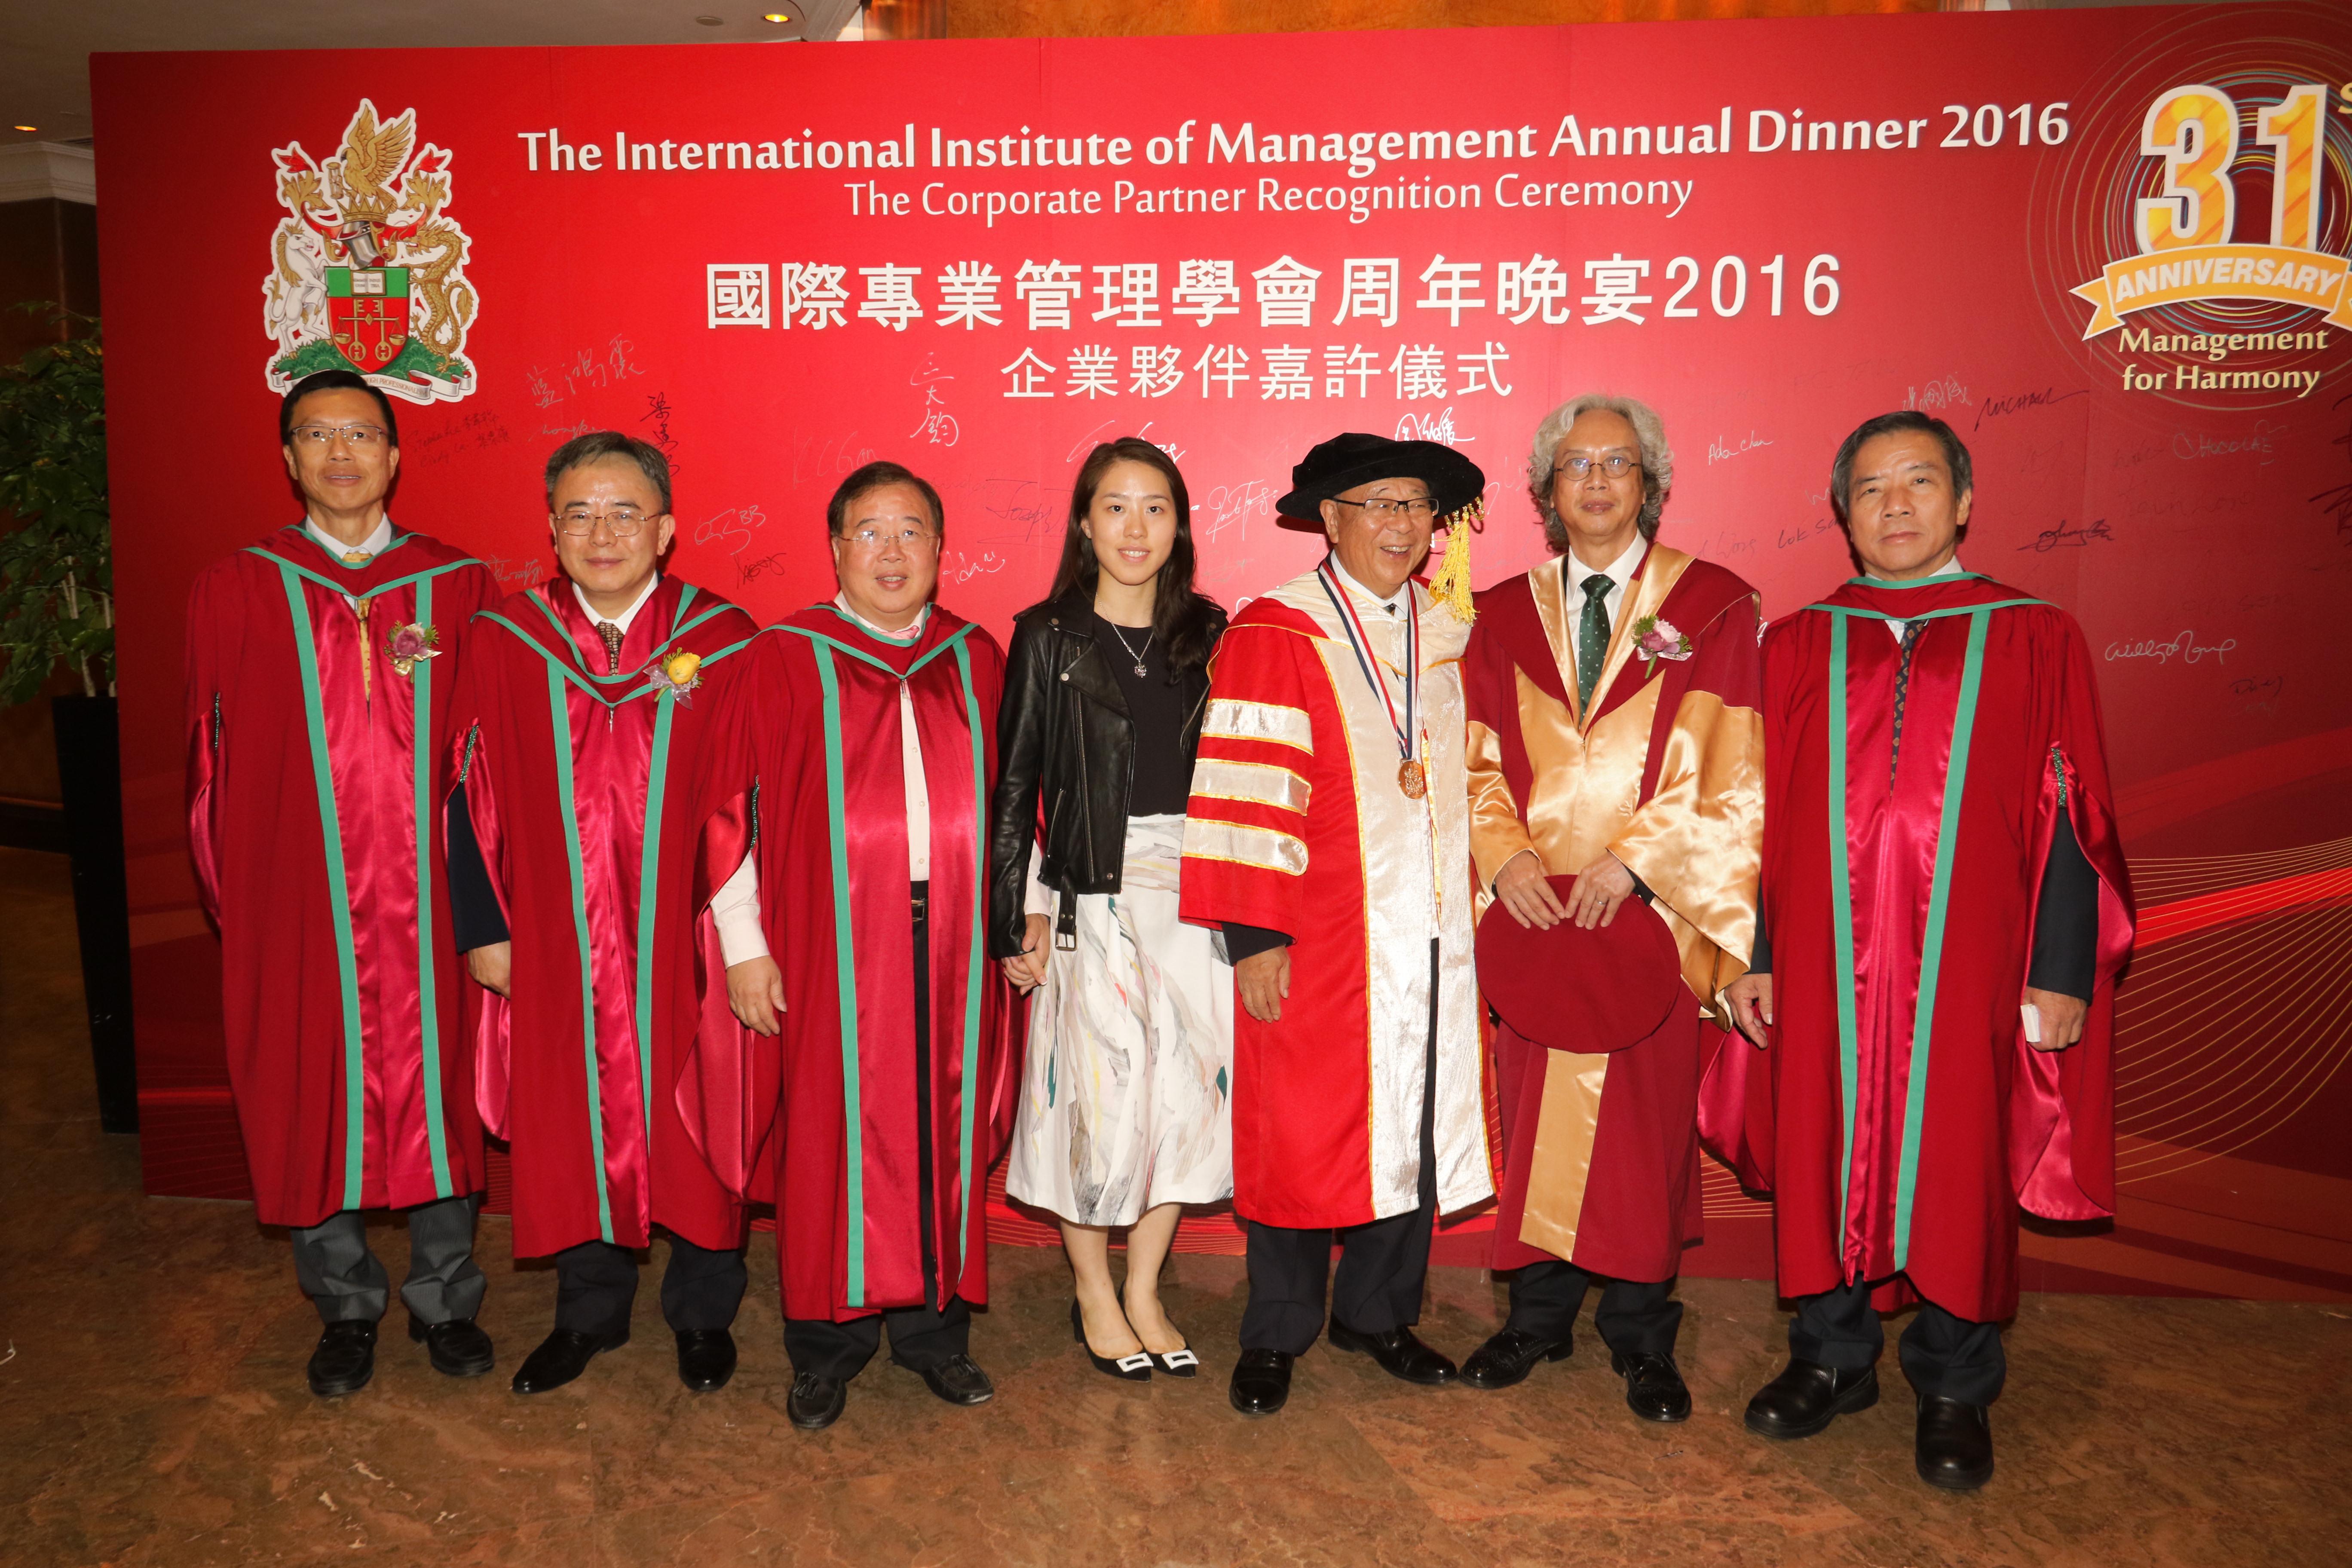 IIM Annual Dinner 2016